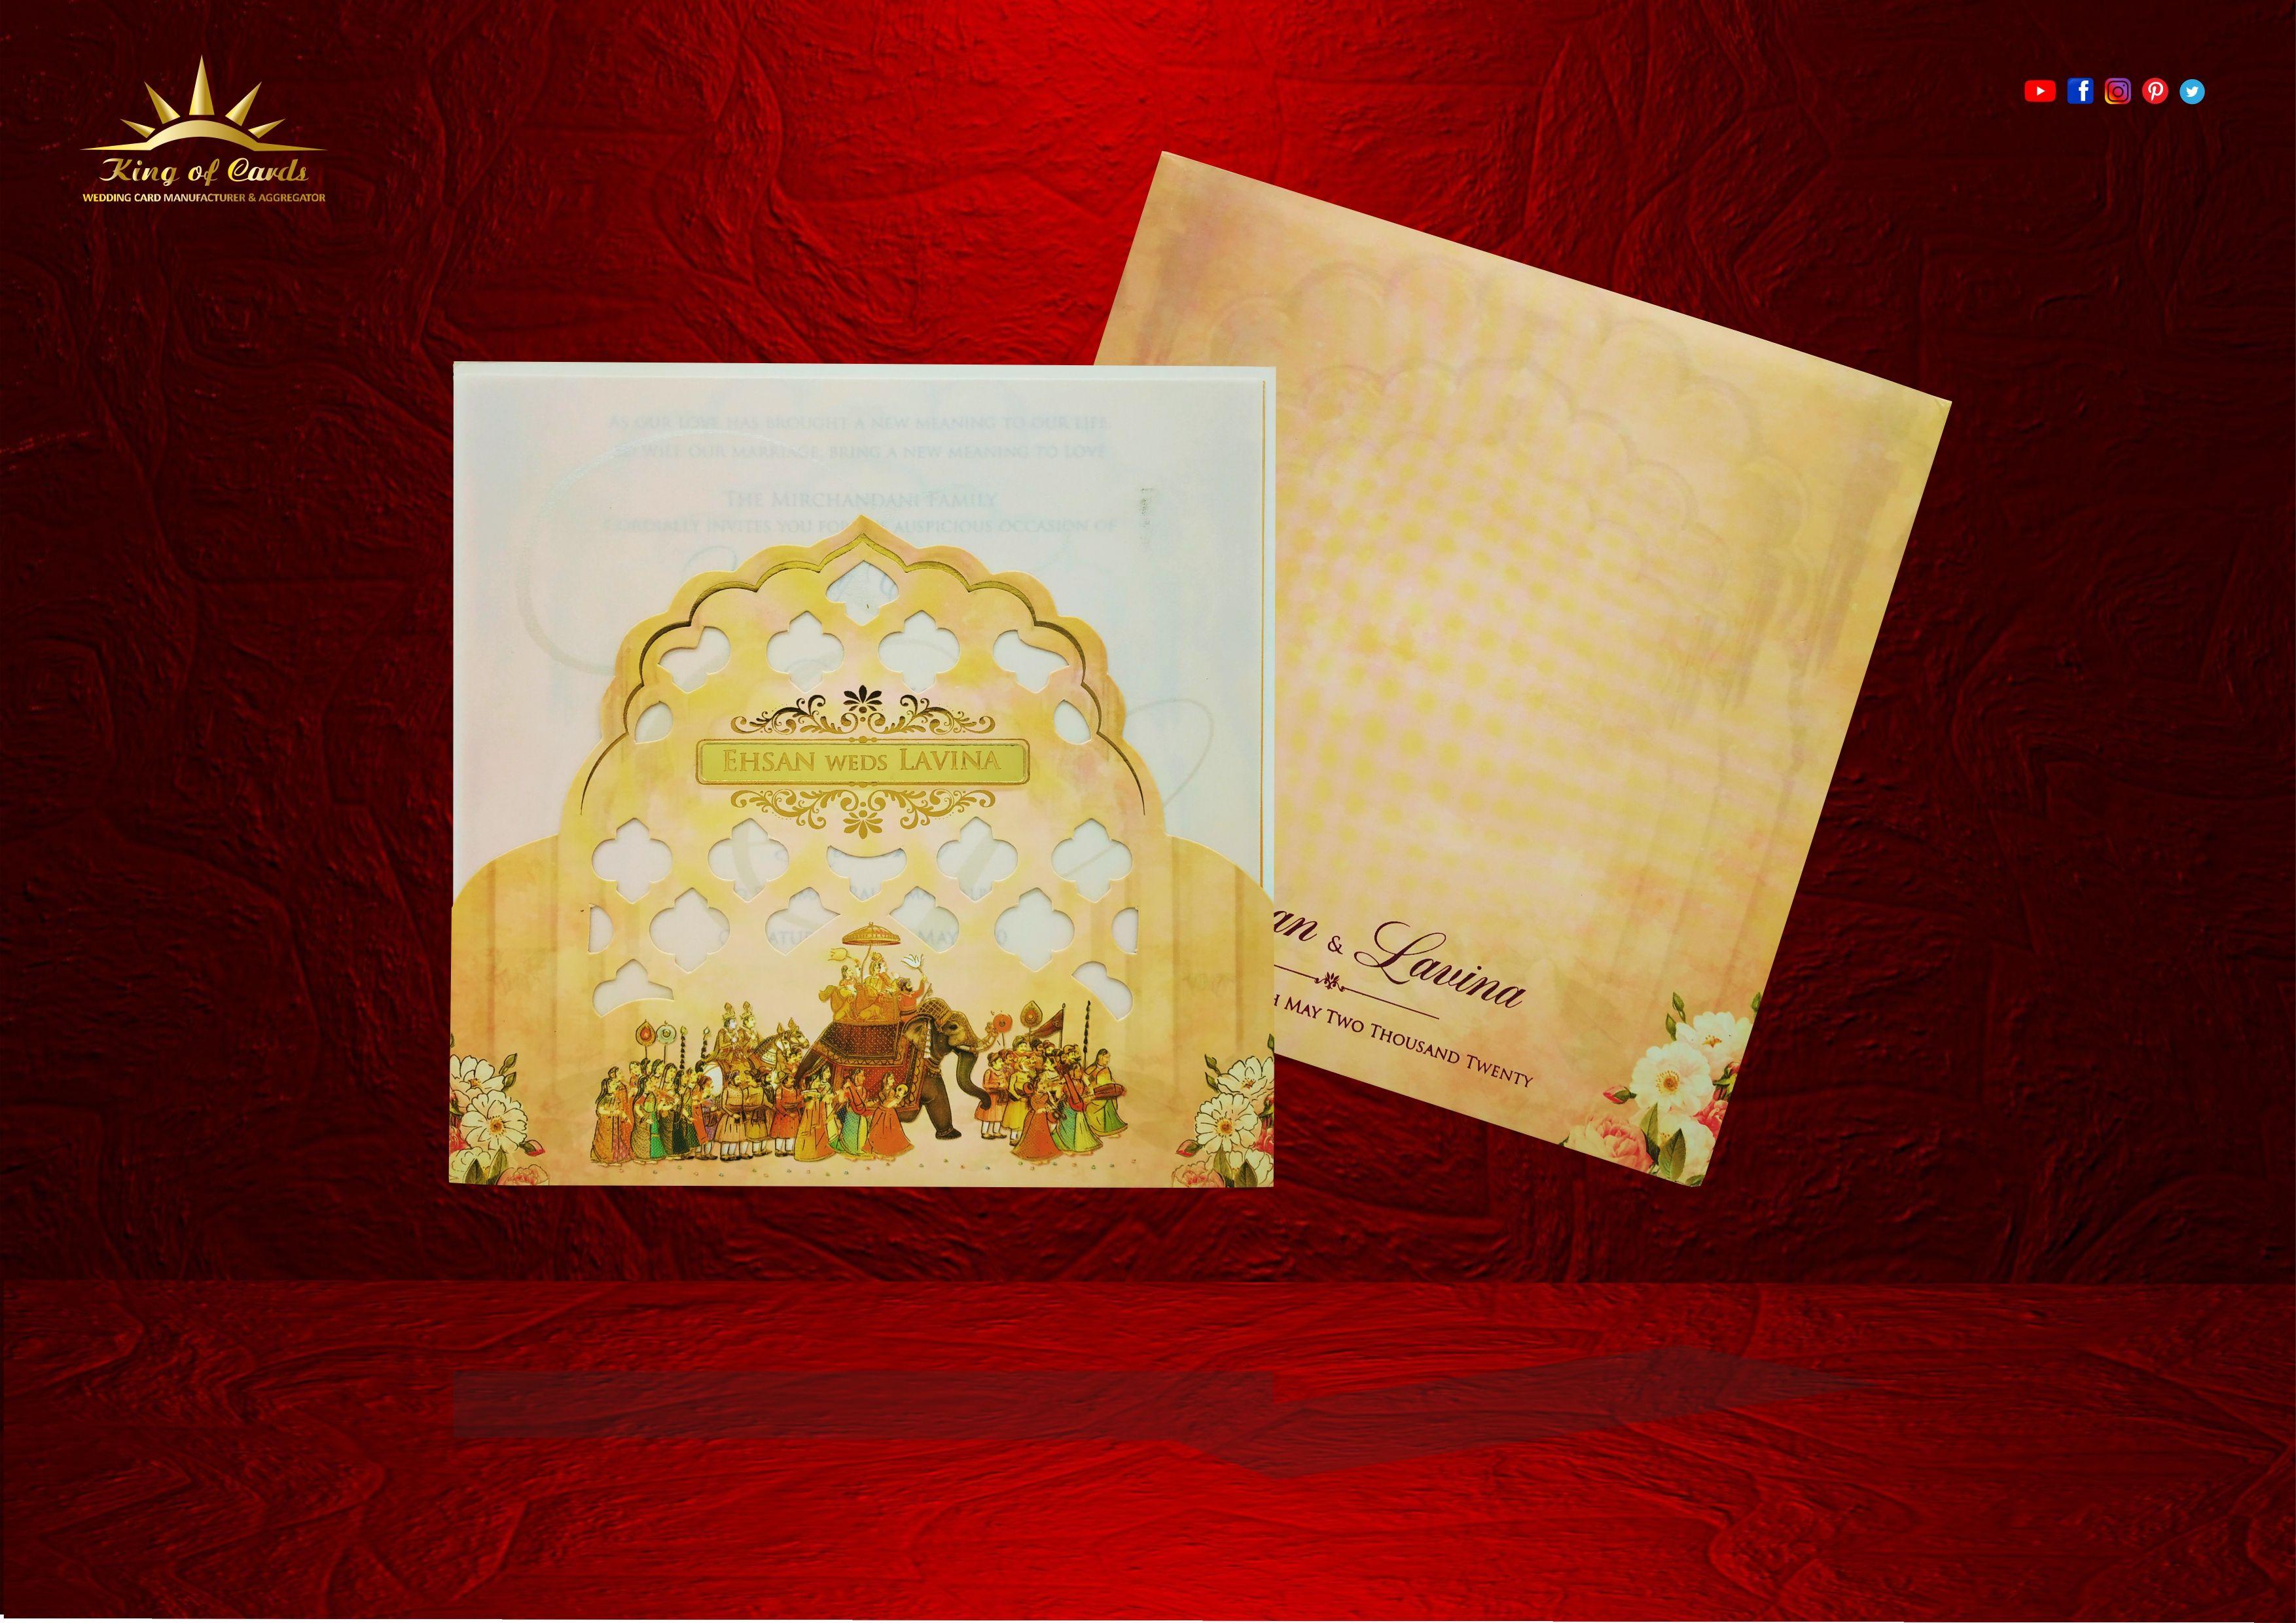 #weddingcard #weddinginvitation #wedding #invitations #invitationdesign #invitationcard #invitationdesigner #kingofcards